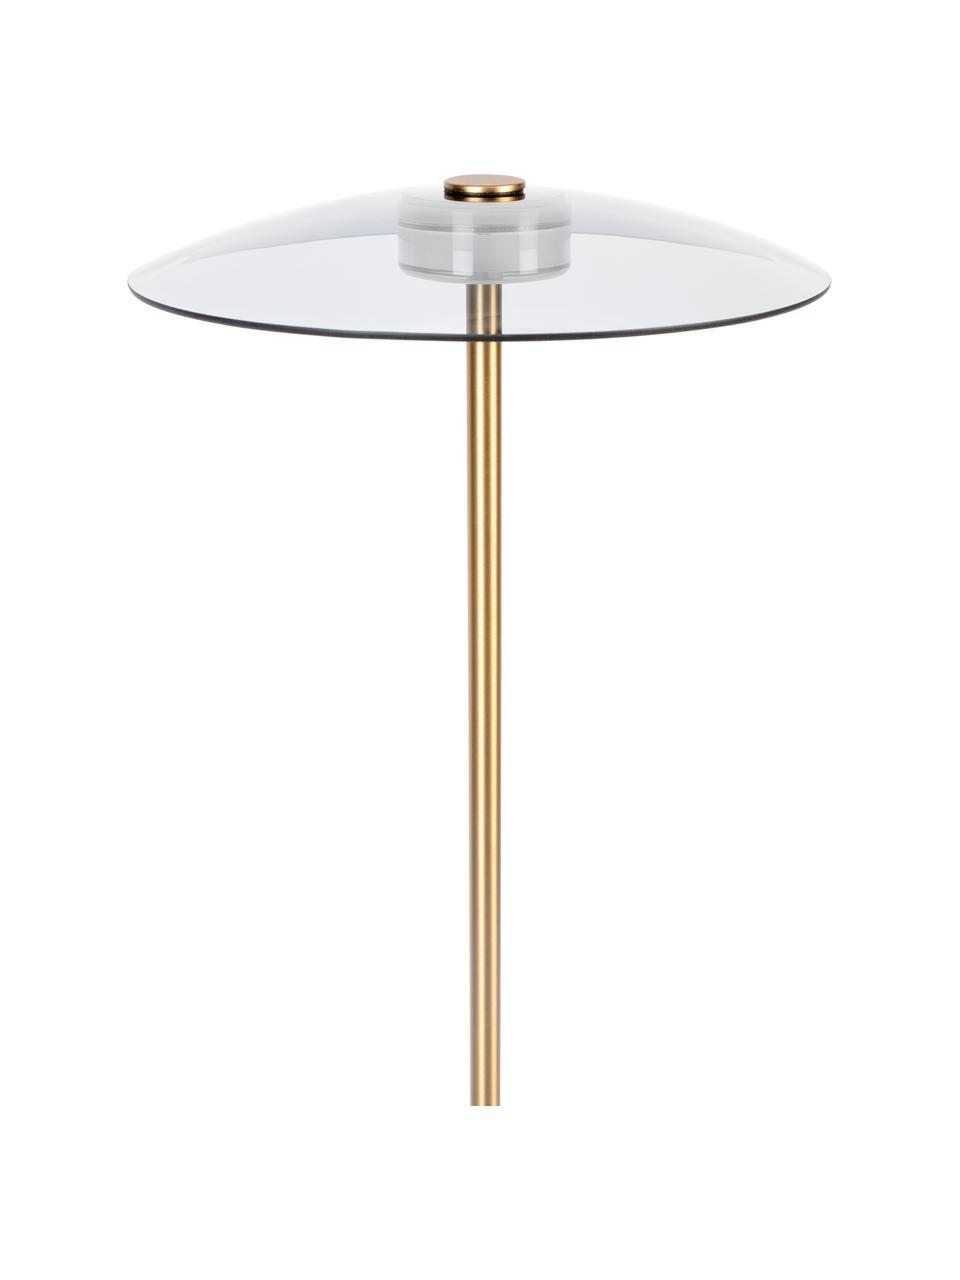 Kleine dimbare LED leeslamp Float van glas, Lampenkap: glas, Lampvoet: glas, Goudkleurig, transparant, Ø 30 x H 132 cm